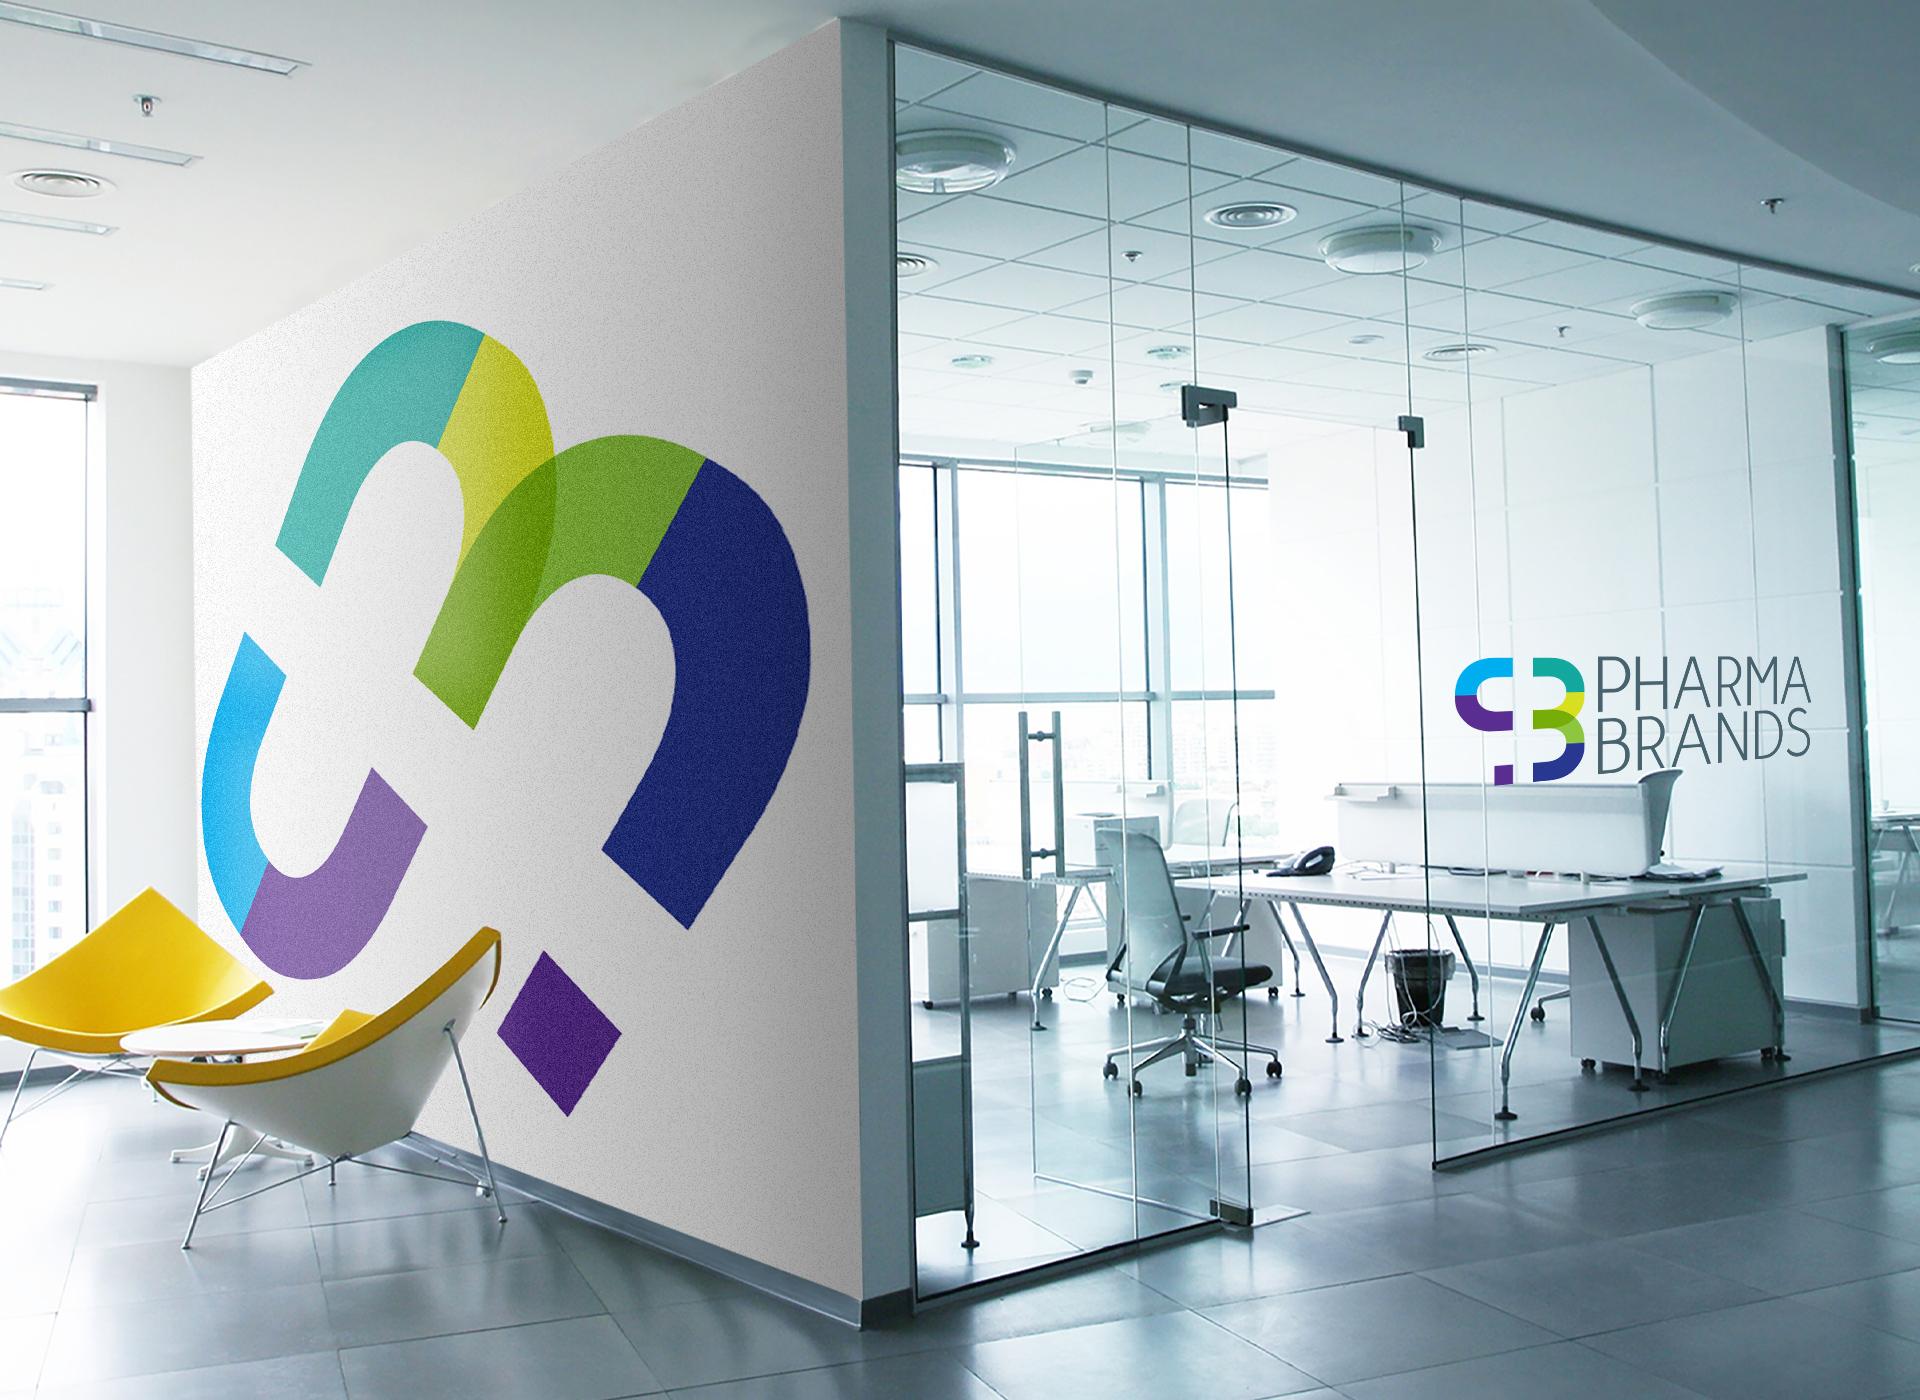 pharma brands wall portofoliu inoveo